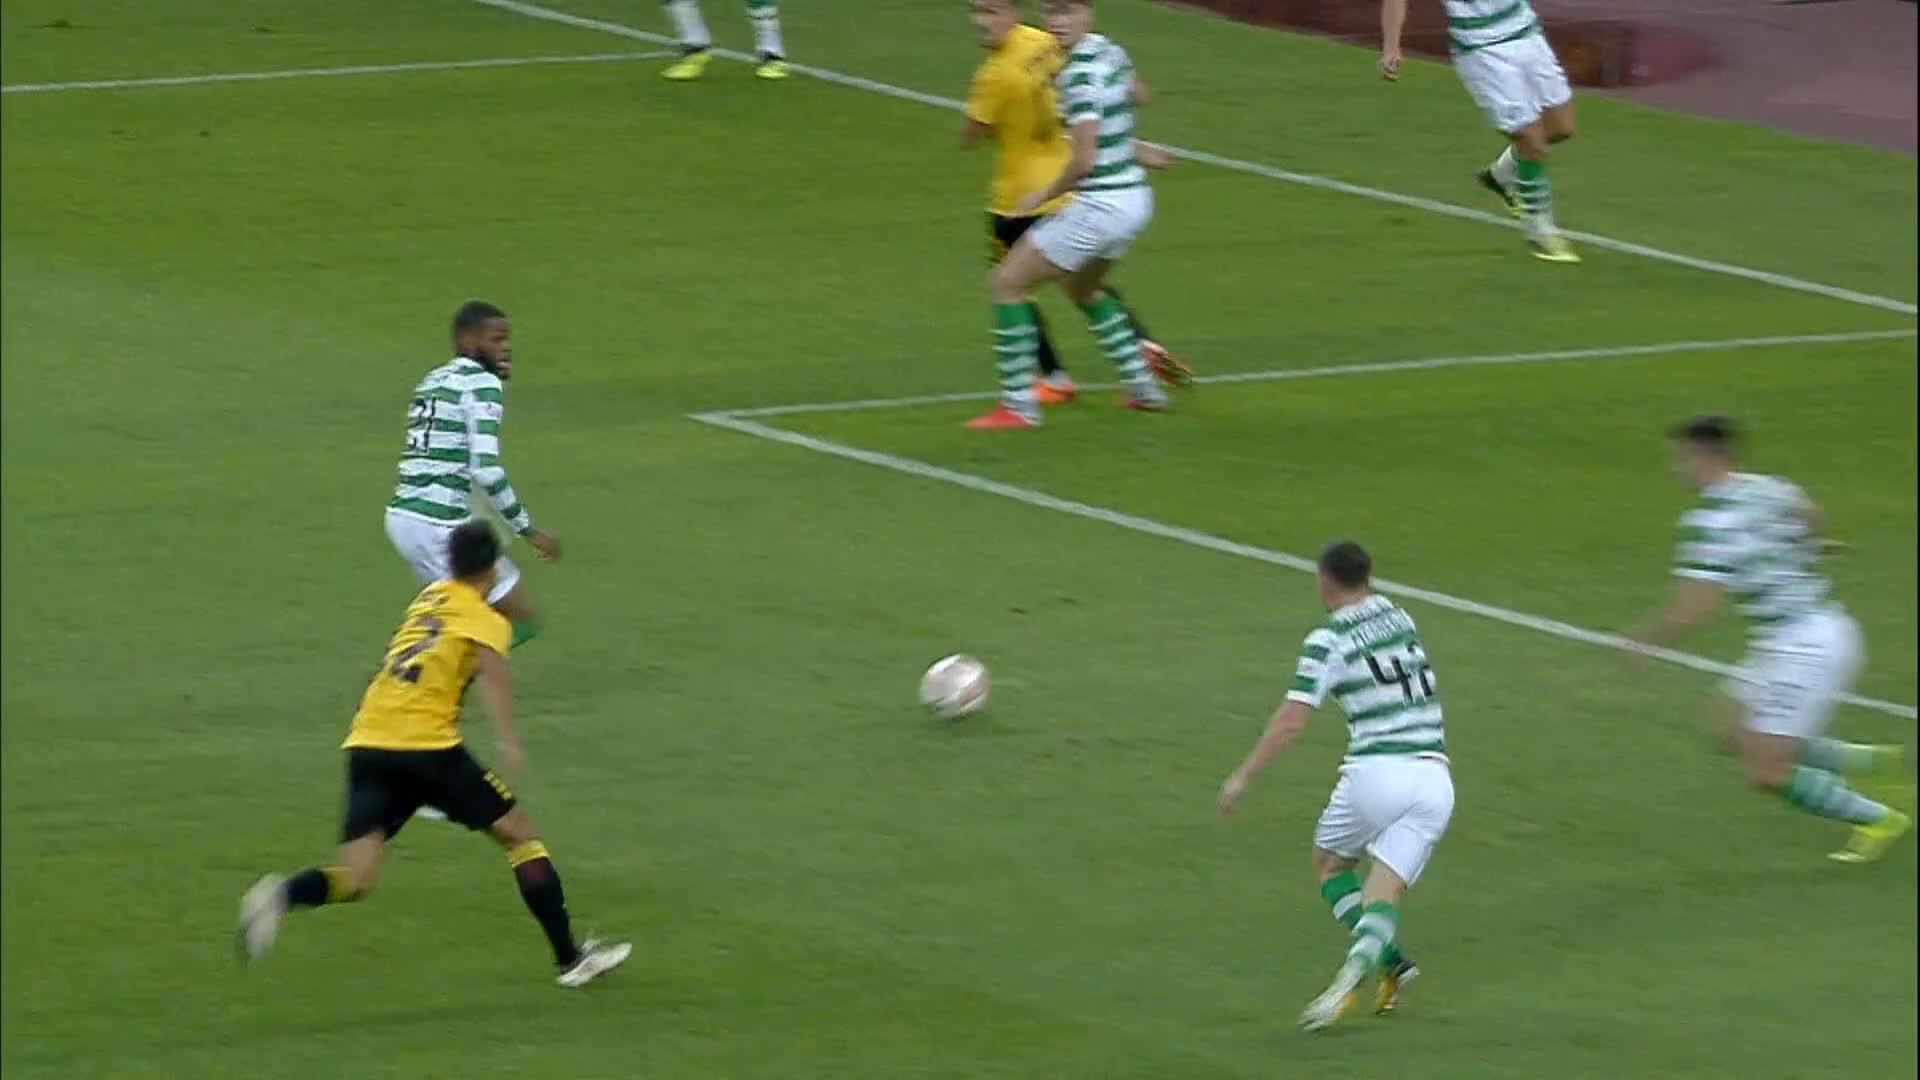 AEK Athens 2-1 Celtic (AEK Athens win 3-2 on aggregate)